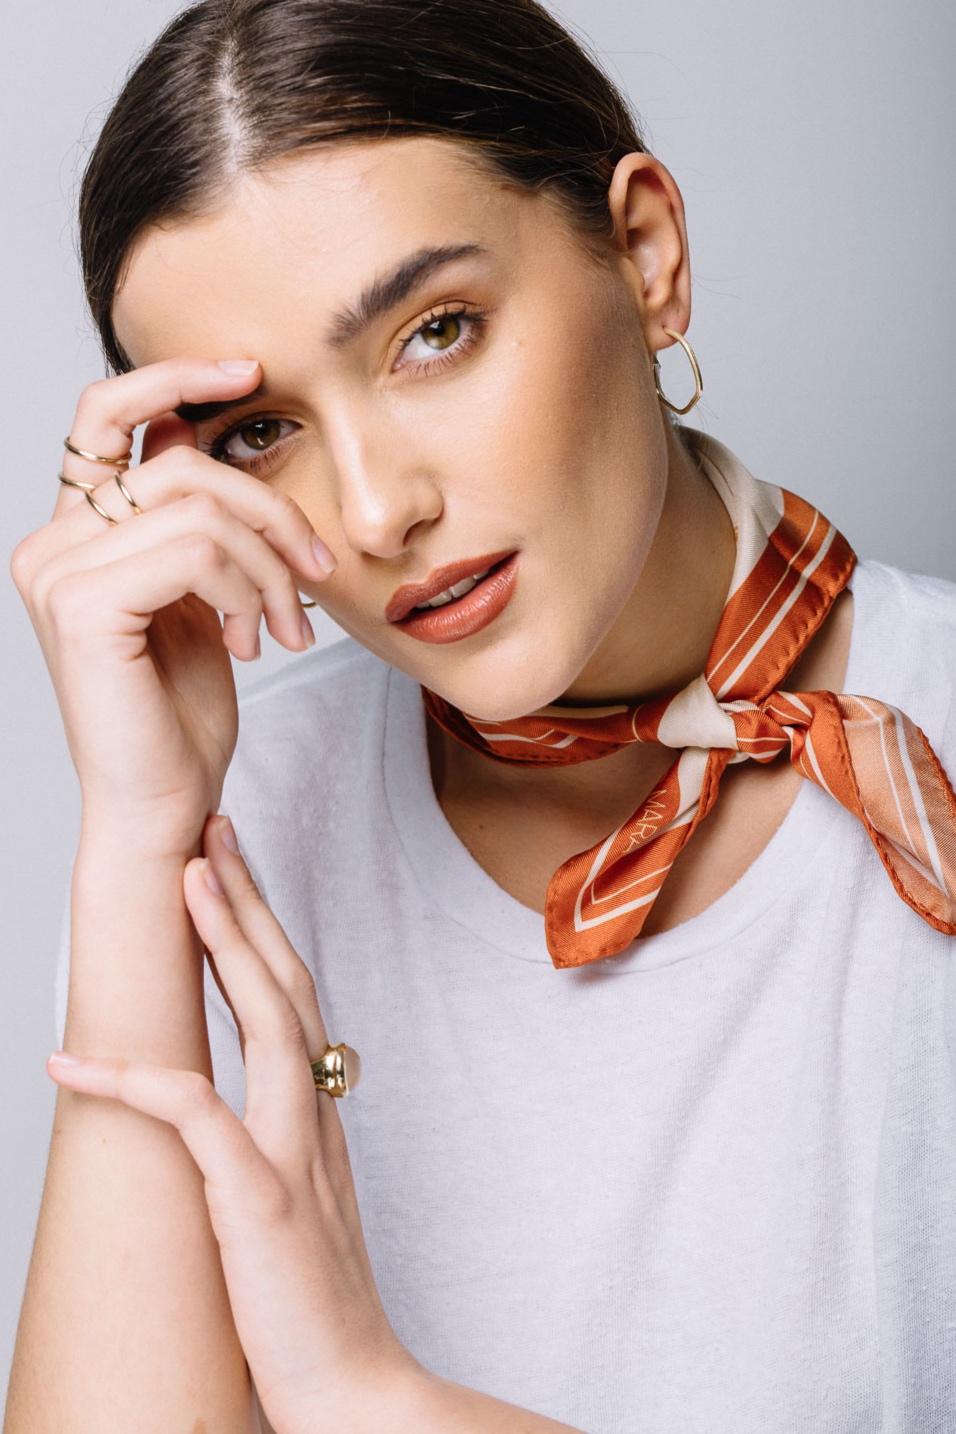 Bristol+Fashion+Photographer+-Megan+Gisborne+Photography-2.jpg